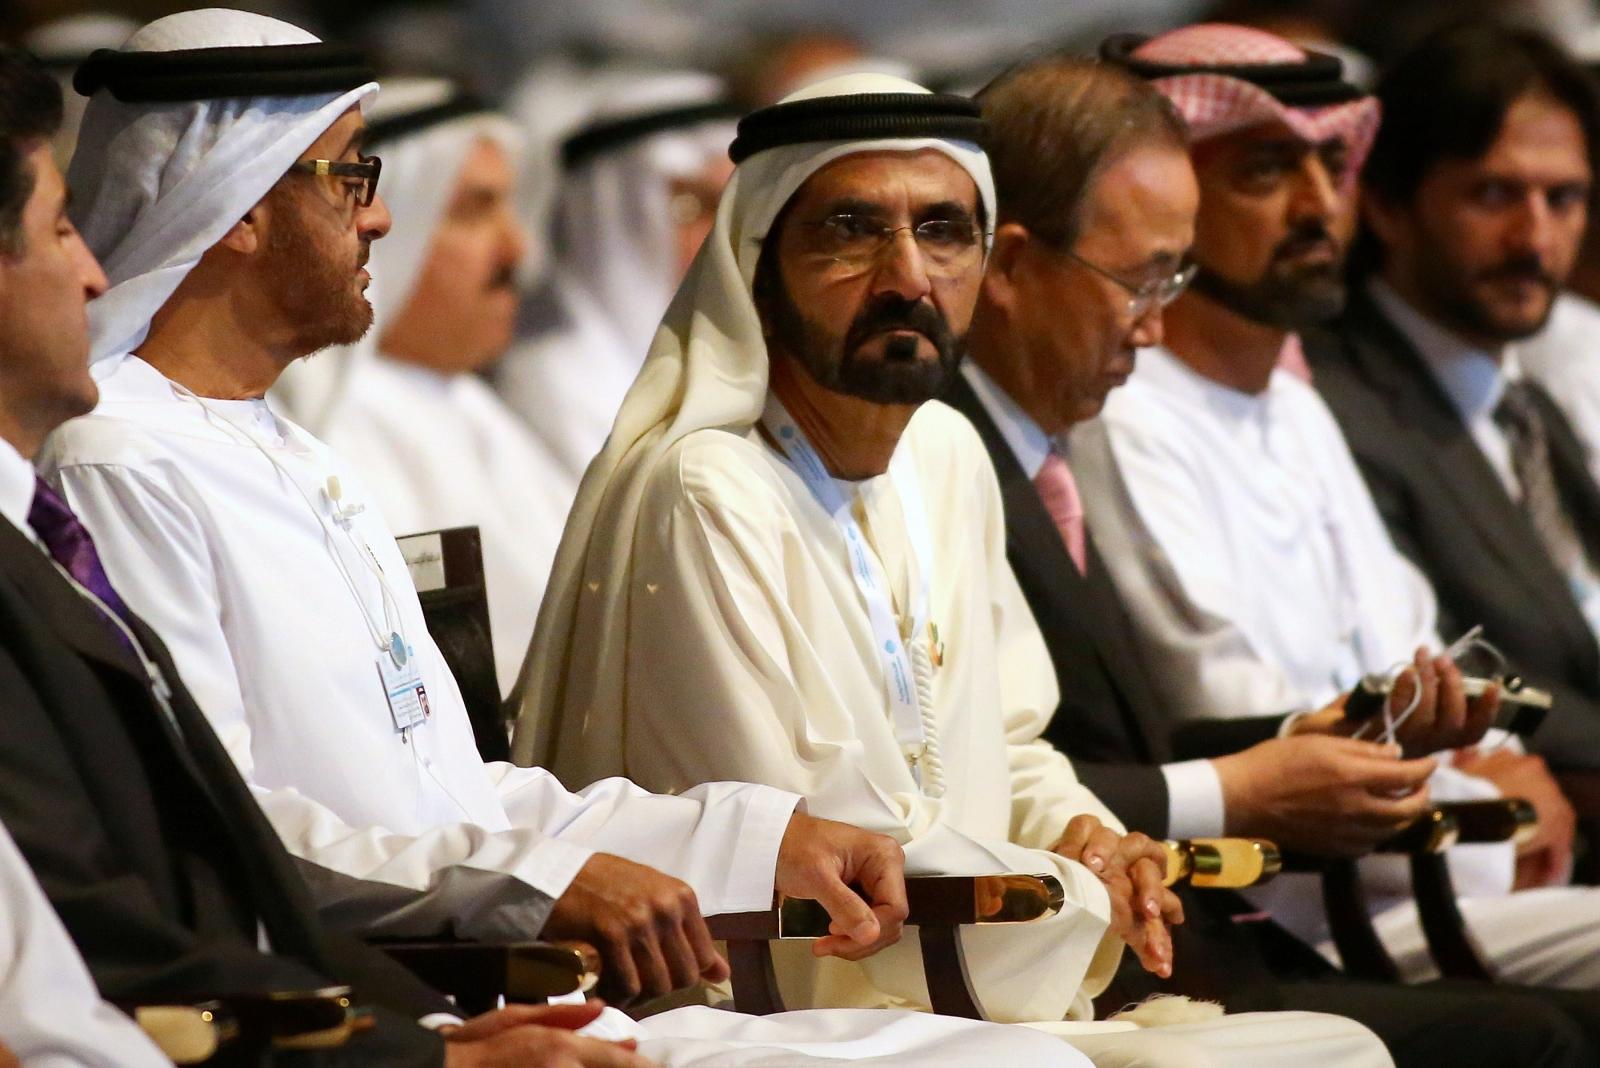 Dubai Sheikh alongside Ban Ki Moon